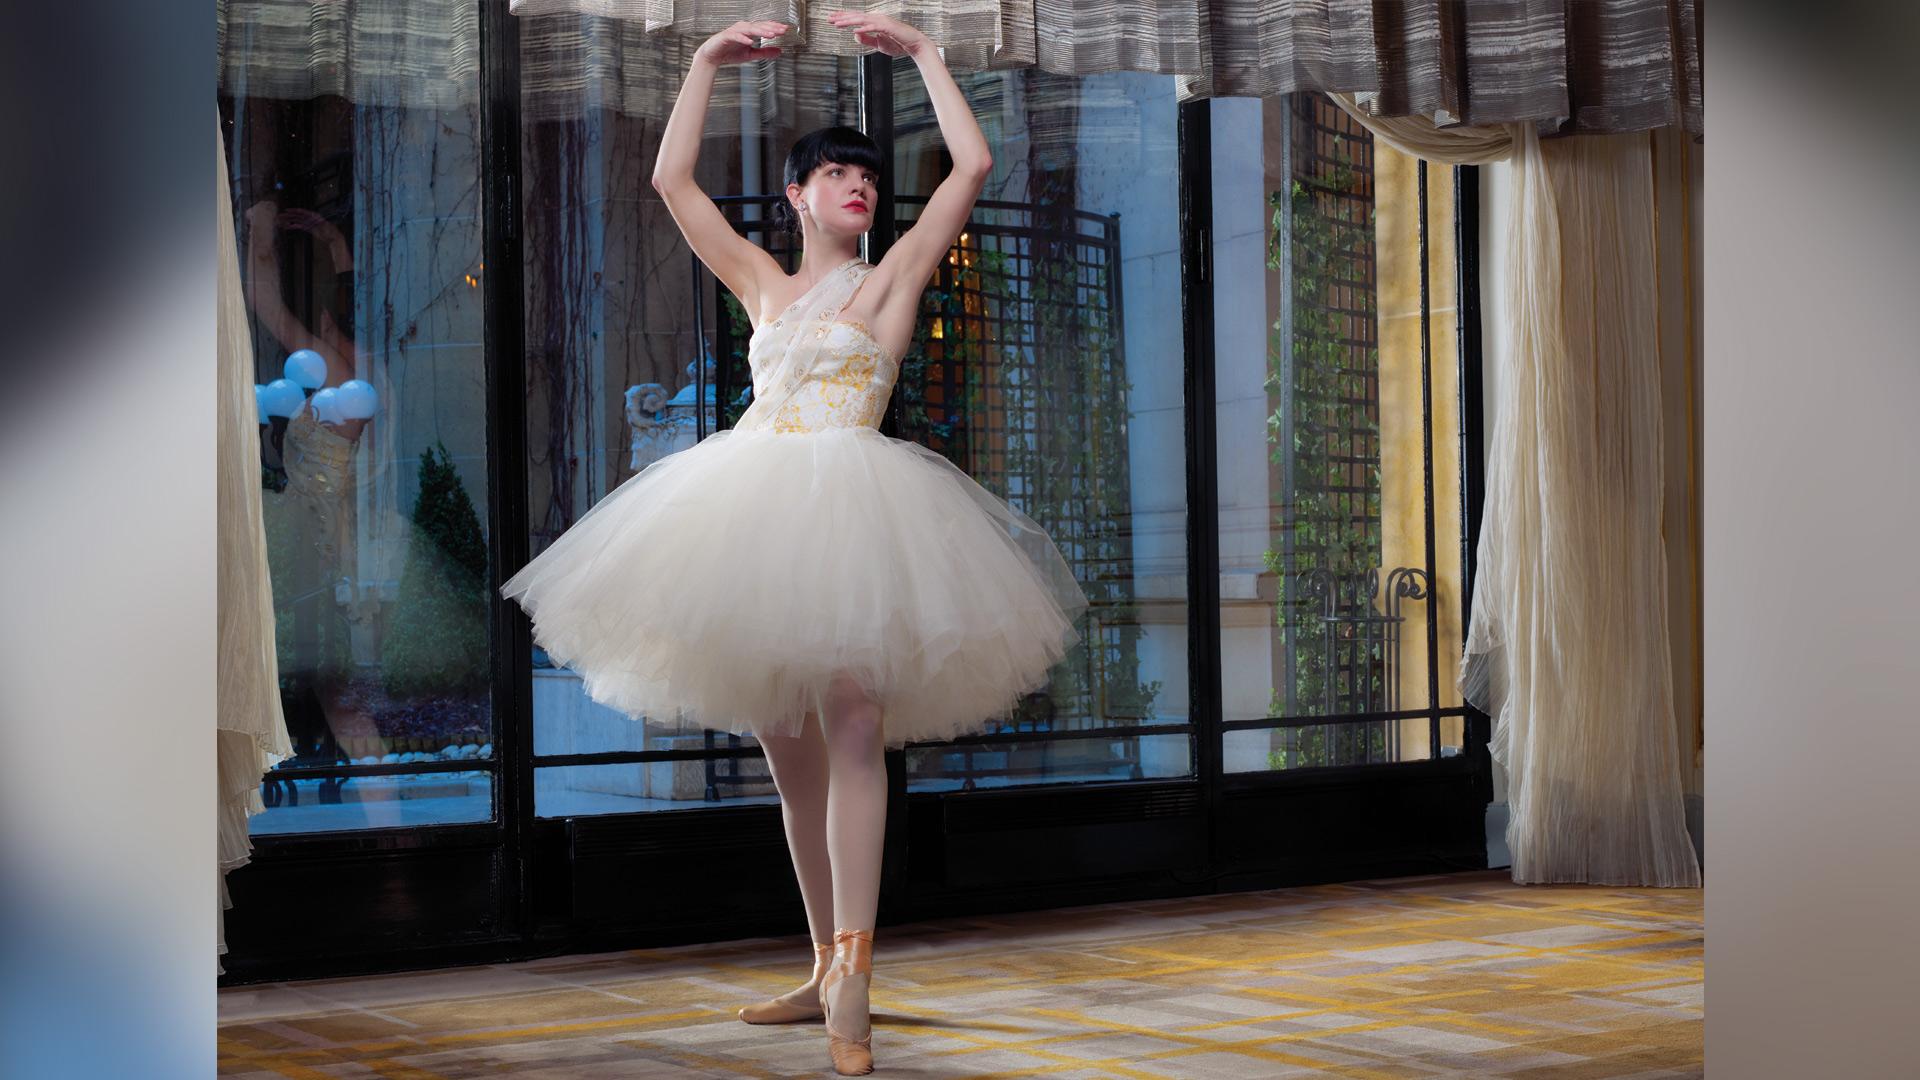 Pauley Perrette as a prima ballerina